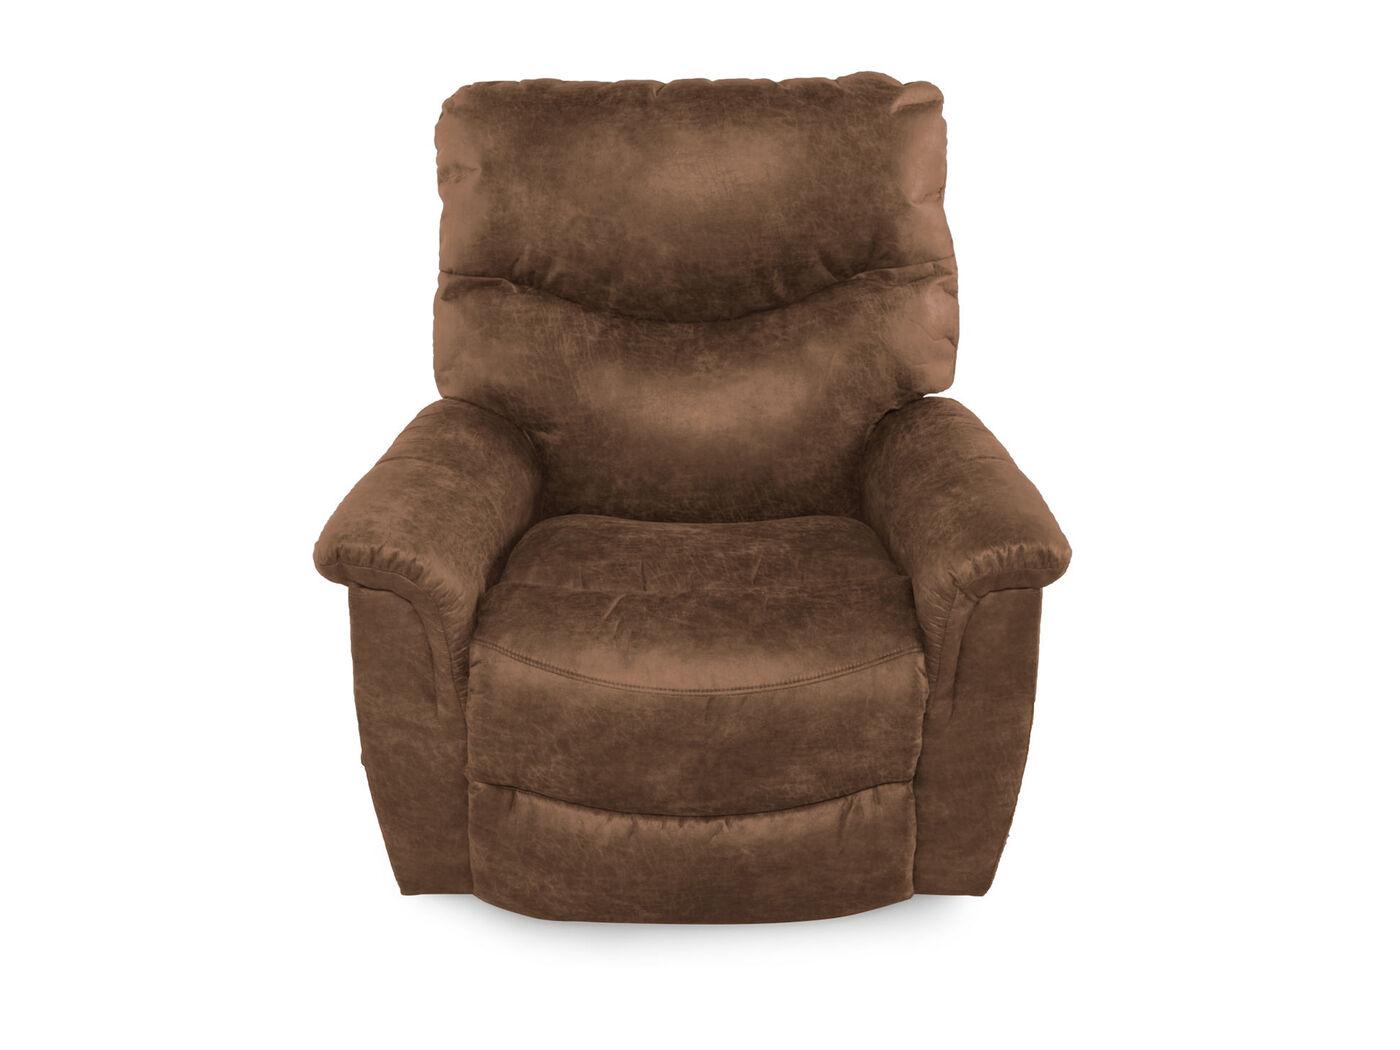 La-Z-Boy James Silt Renew Leather Recliner : Mathis Brothers Furniture